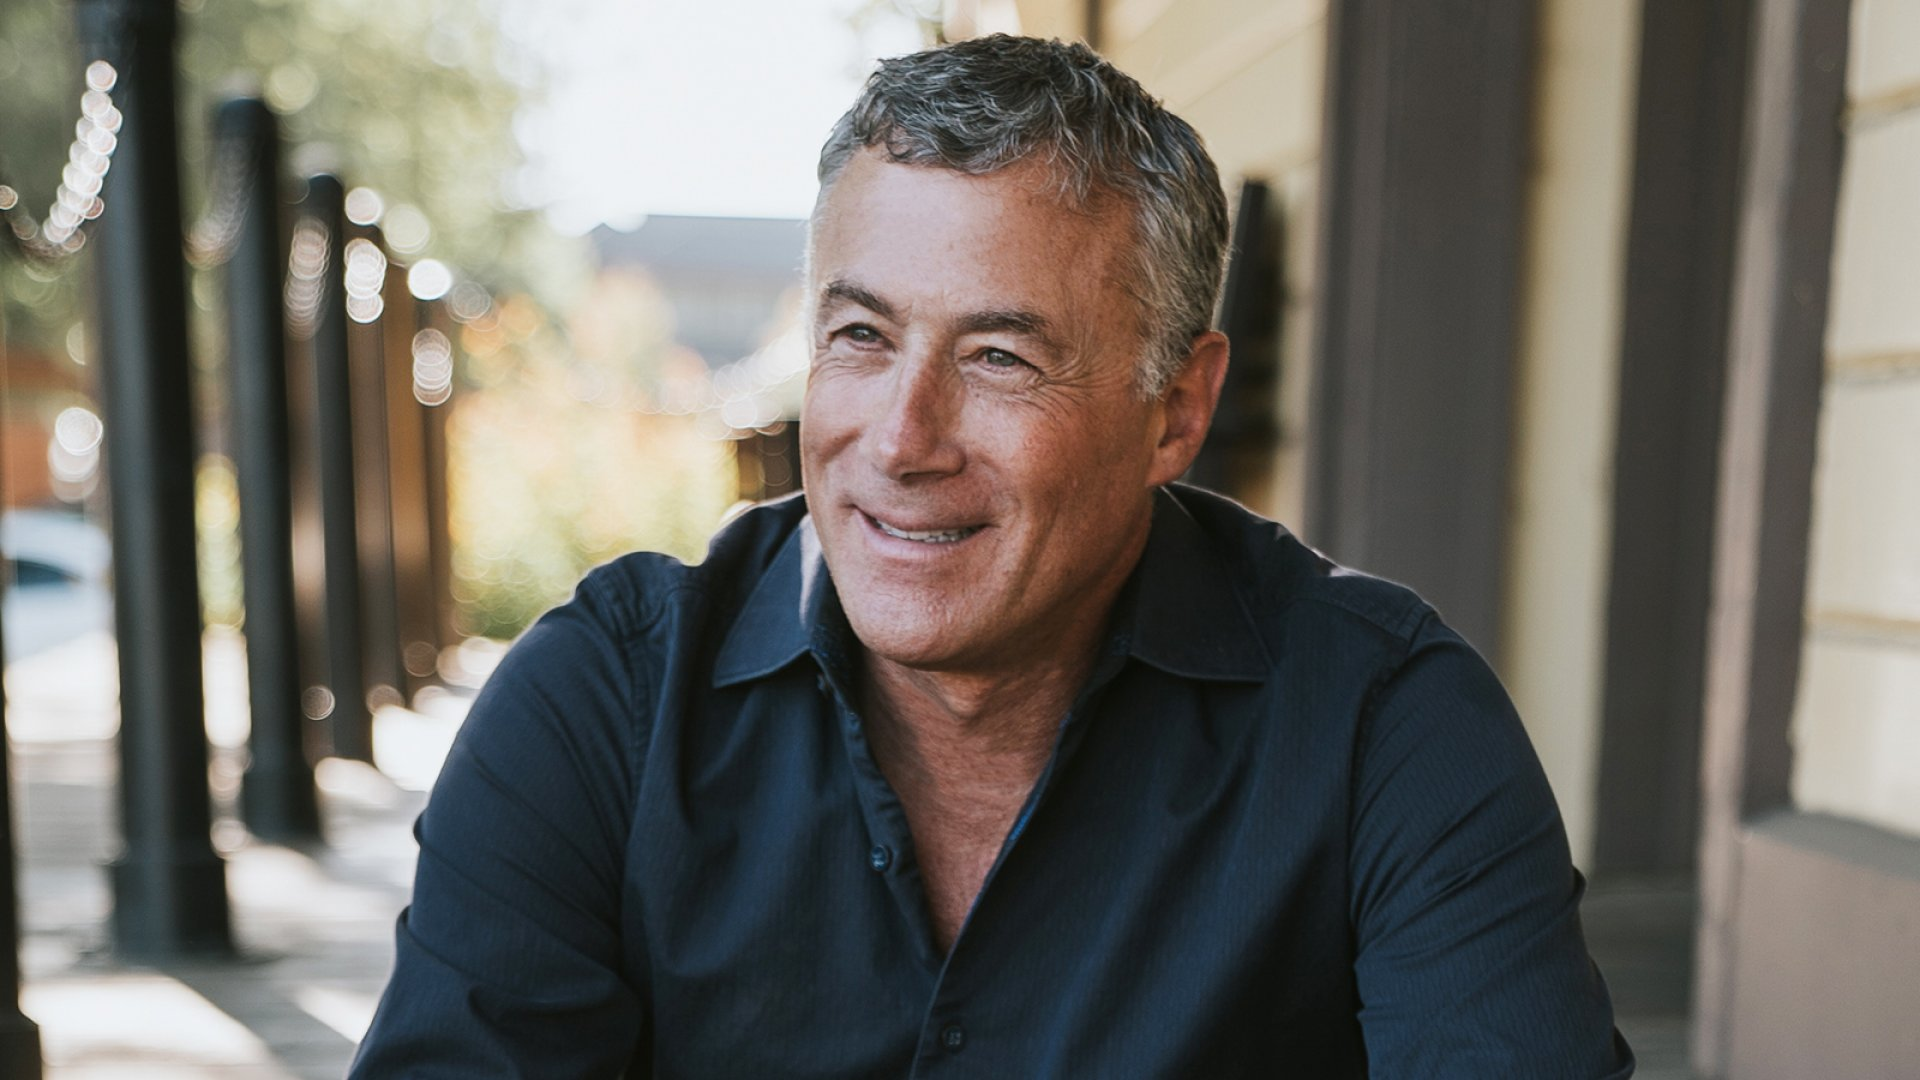 Scott Walchek, CEO of Trōv.